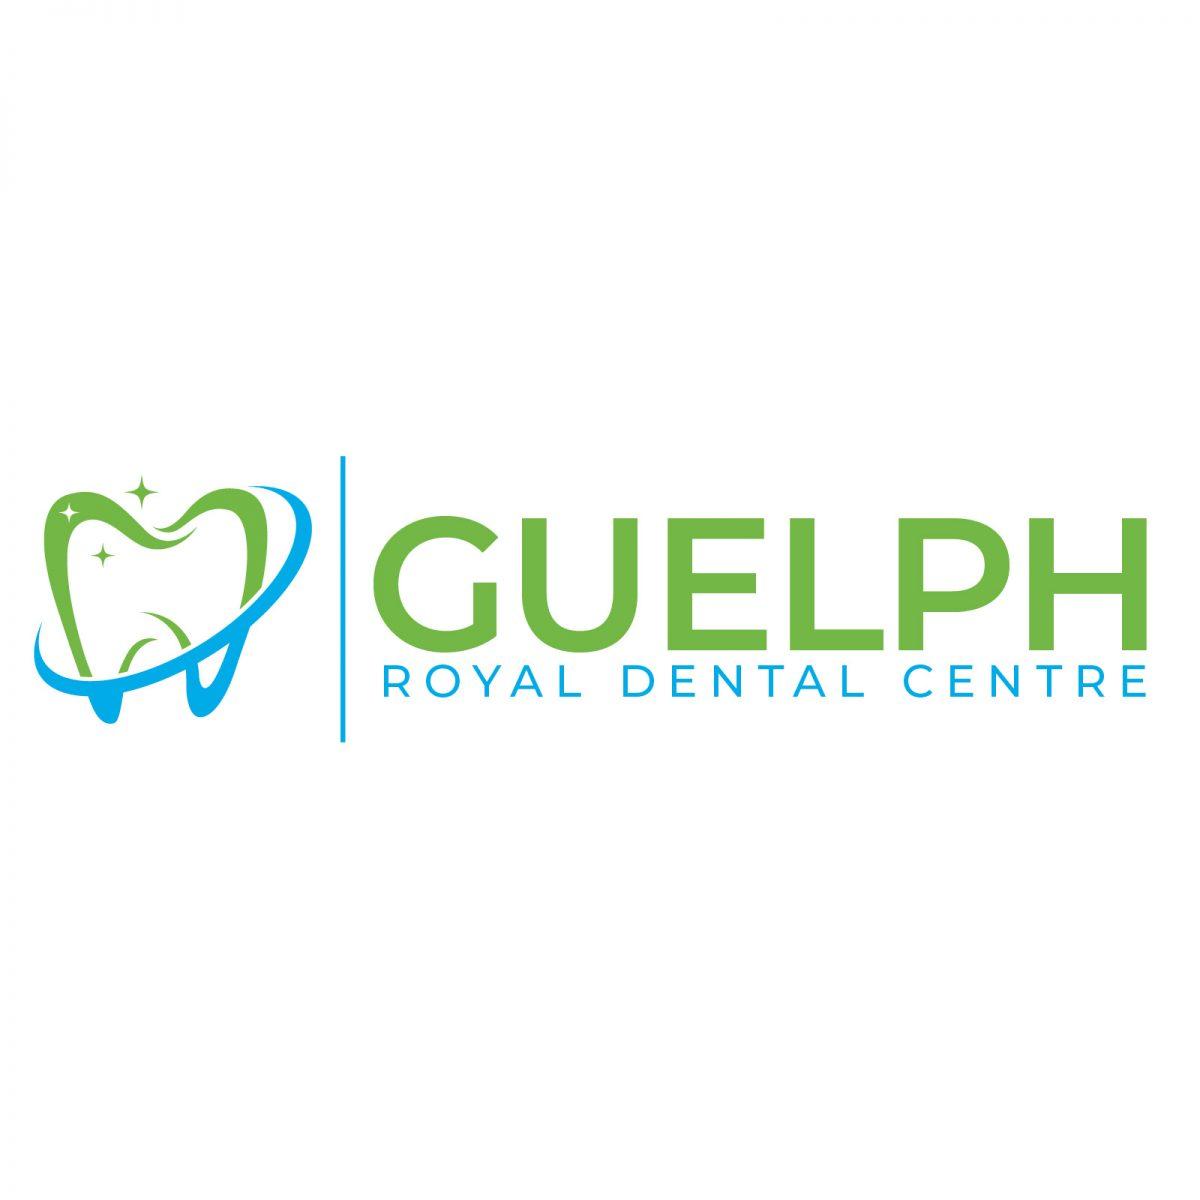 Guelph Royal Dental Centre